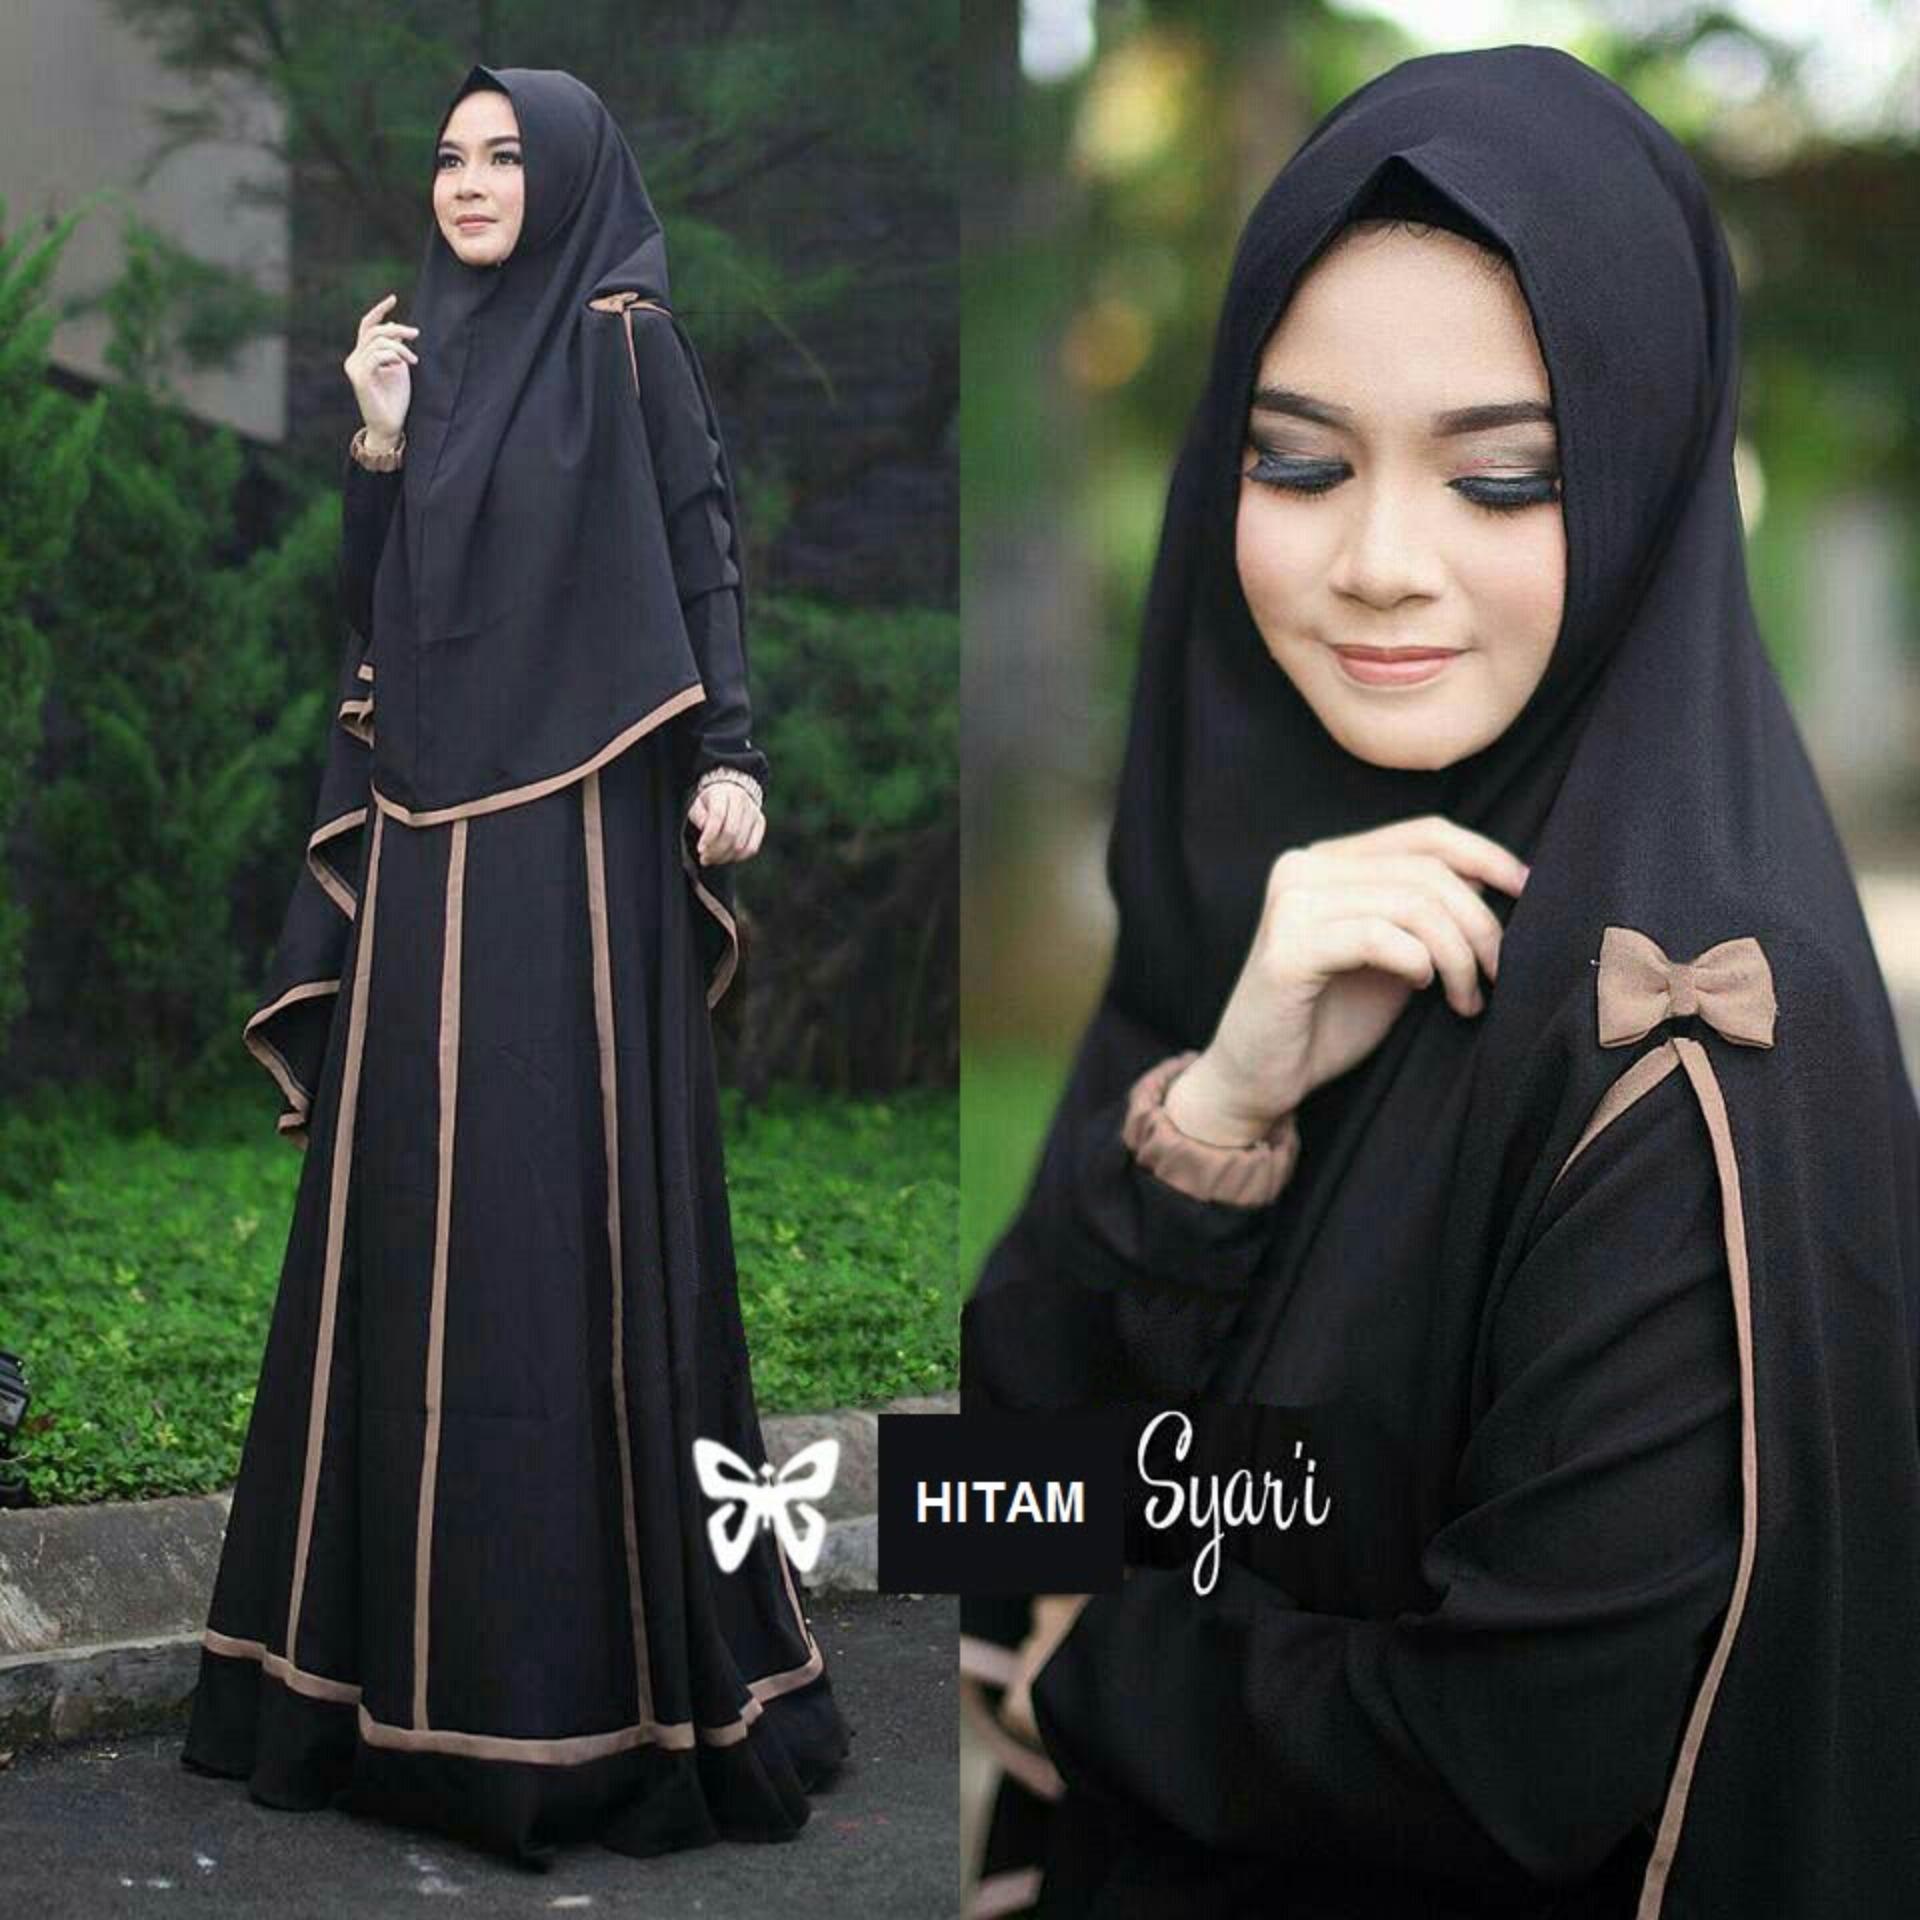 3168f0d3a96706699903f3ea35d7498f Ulasan List Harga Wedding Dress In Muslim Termurah waktu ini